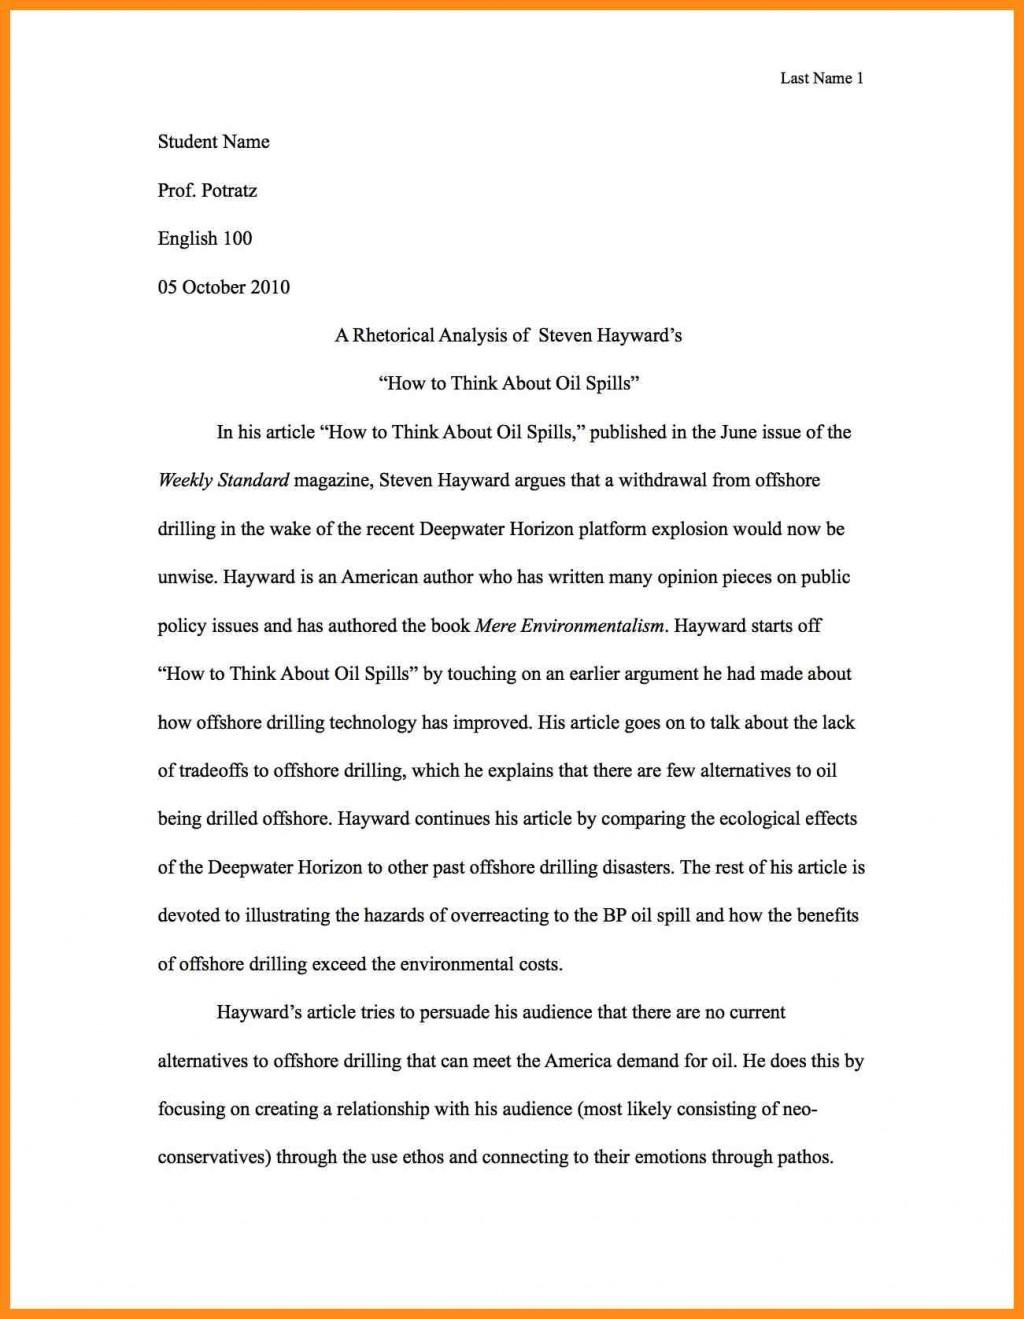 002 Write Best Rhetorical Analysis Essay Example Of Using Ethos Pathos And Logos Impressive A Commercial